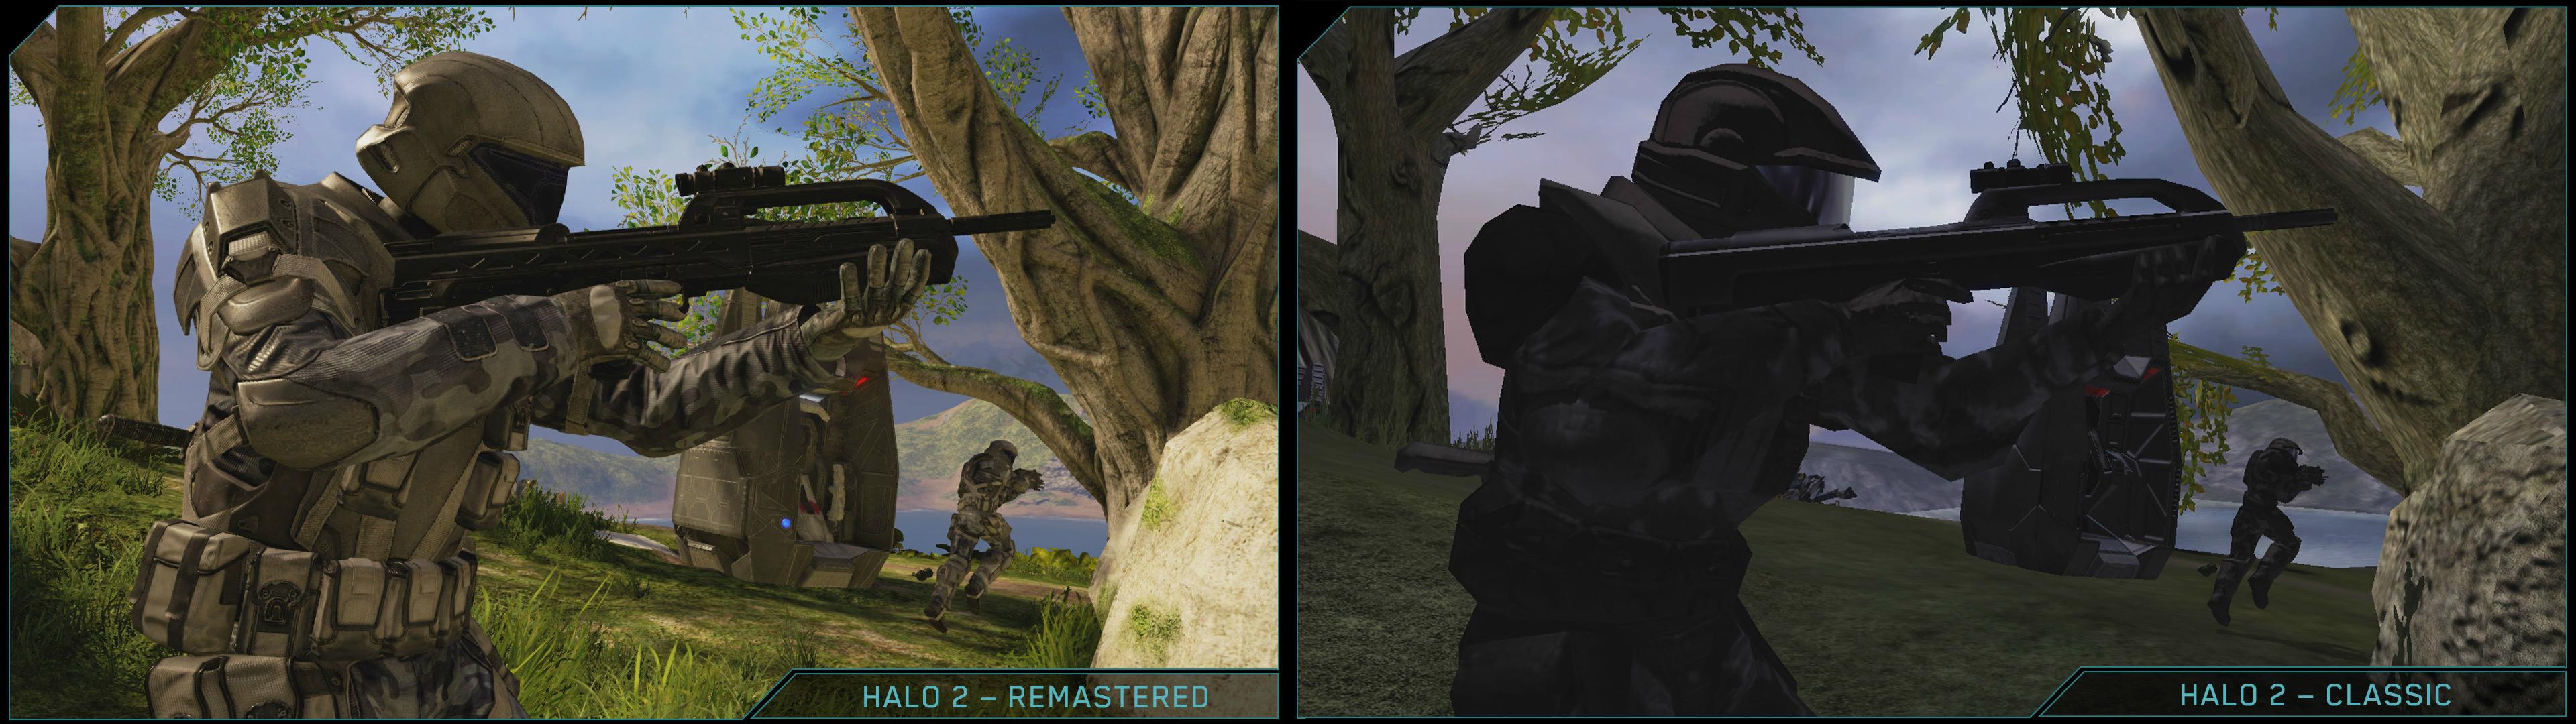 Halo 2 Anniversary Gravemind Comparison Halo 2 Anniversary New Looks